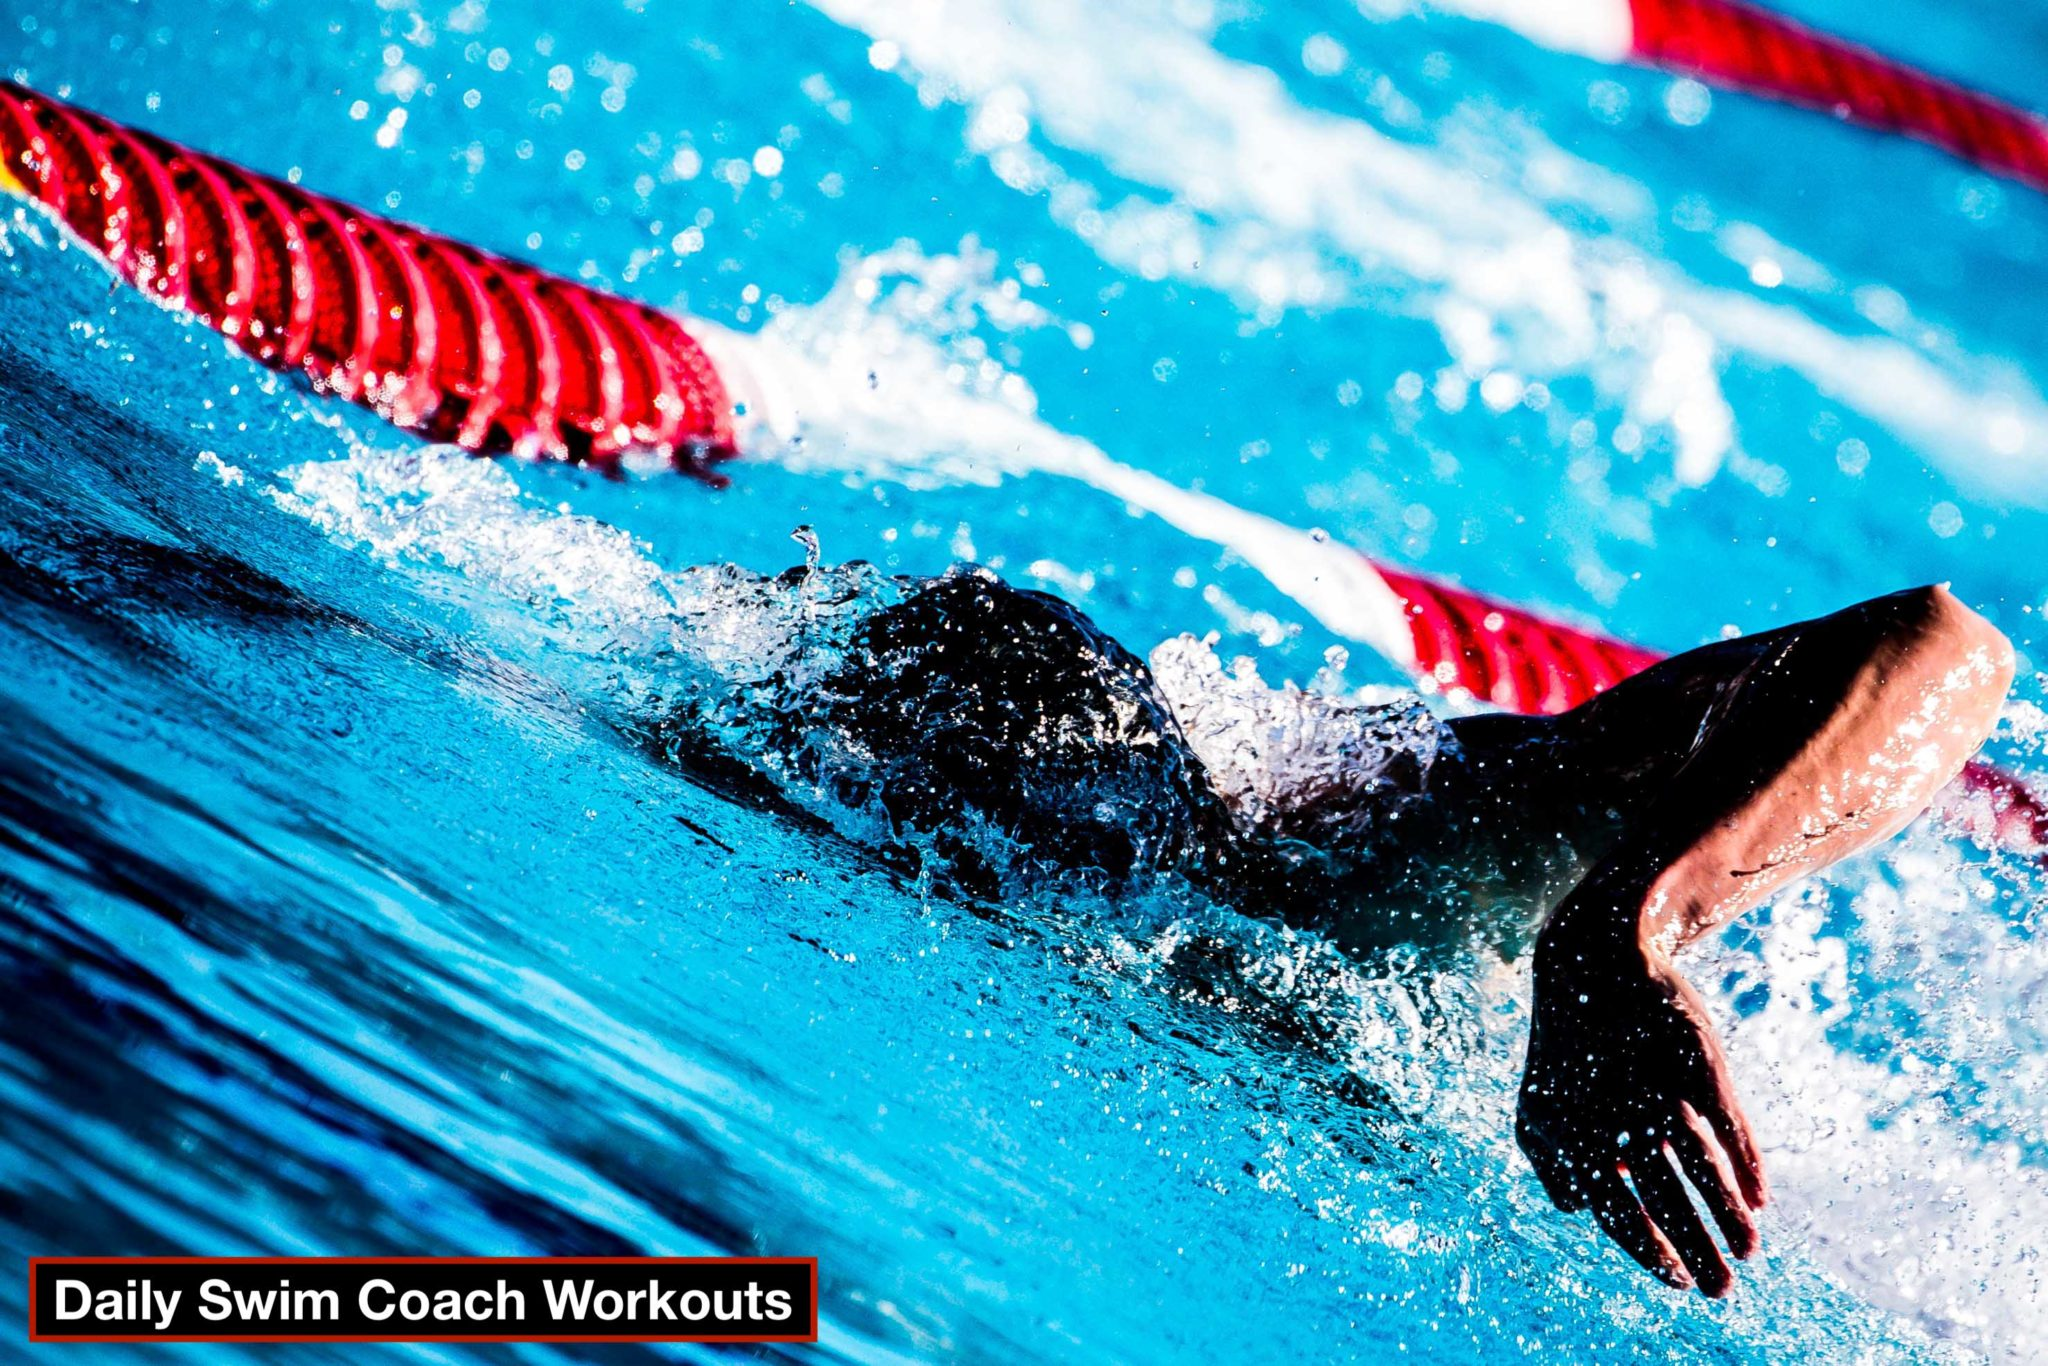 Daily Swim Coach Workout #42